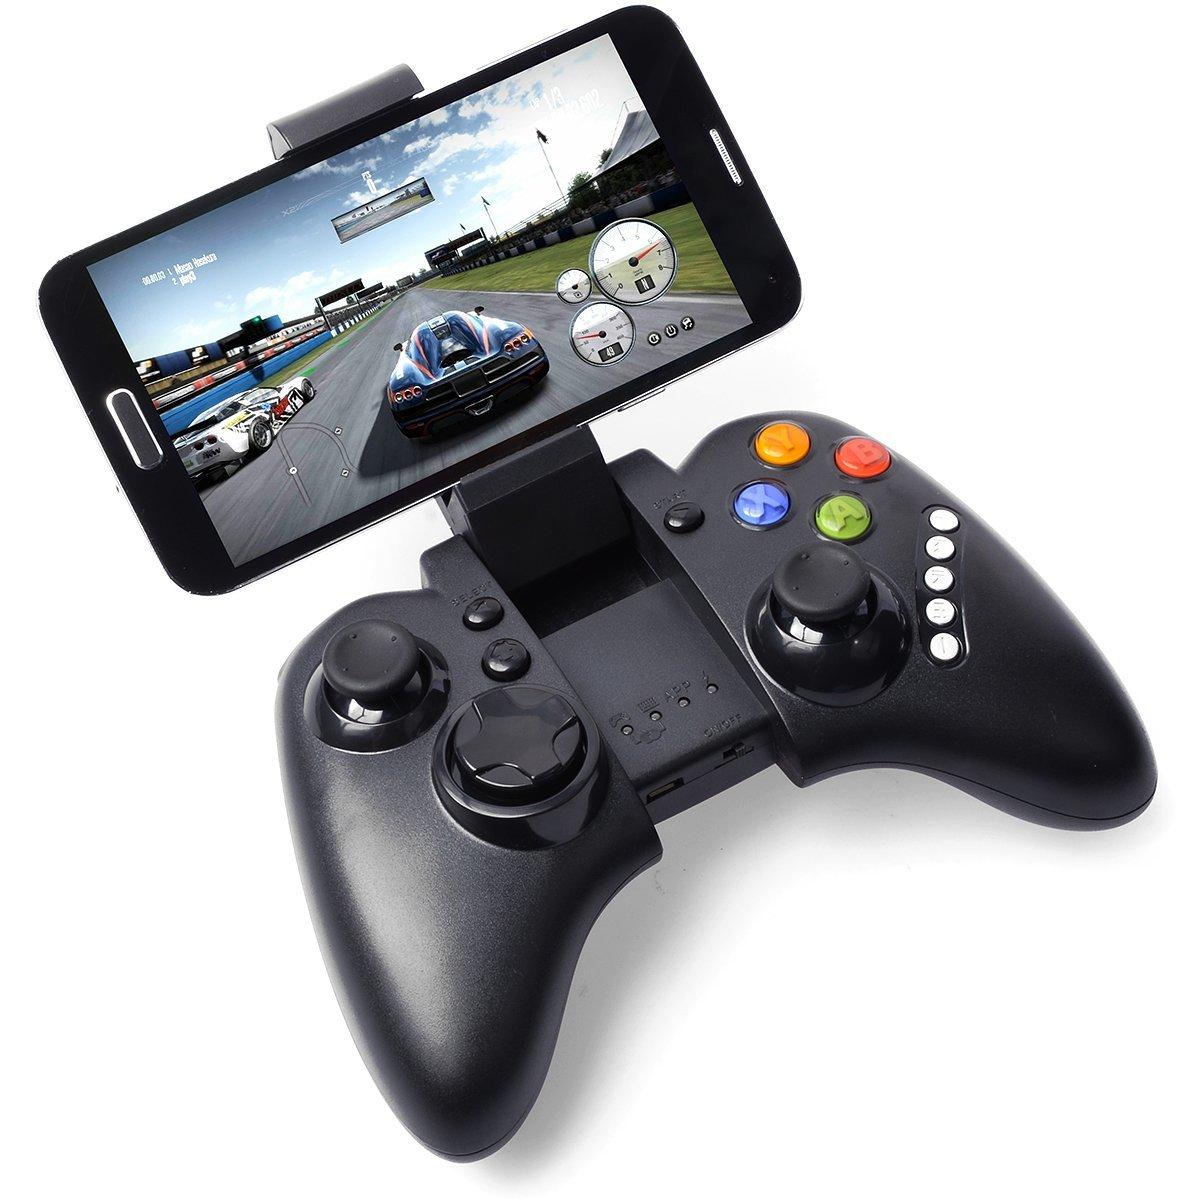 ipega pg 9021 manette du jeu bluetooth 3 0 pour smartphone achat jeux video maroc. Black Bedroom Furniture Sets. Home Design Ideas